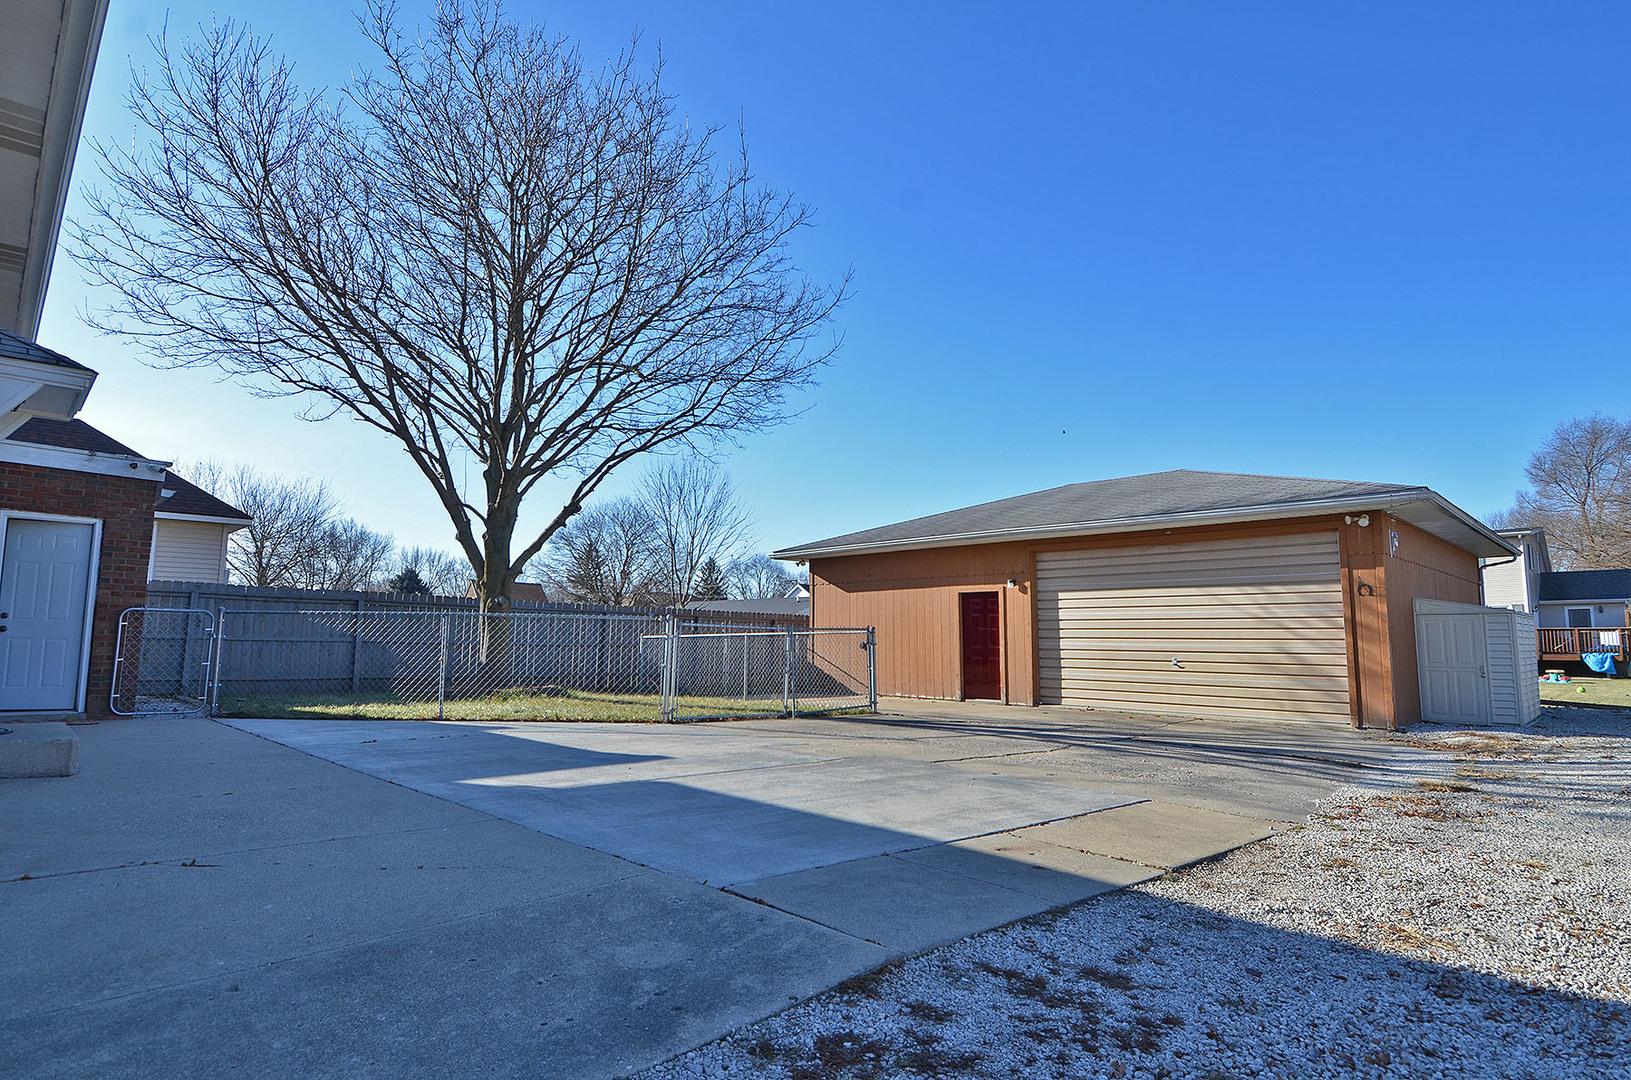 106 BIRMINGHAM, Streator, Illinois, 61364